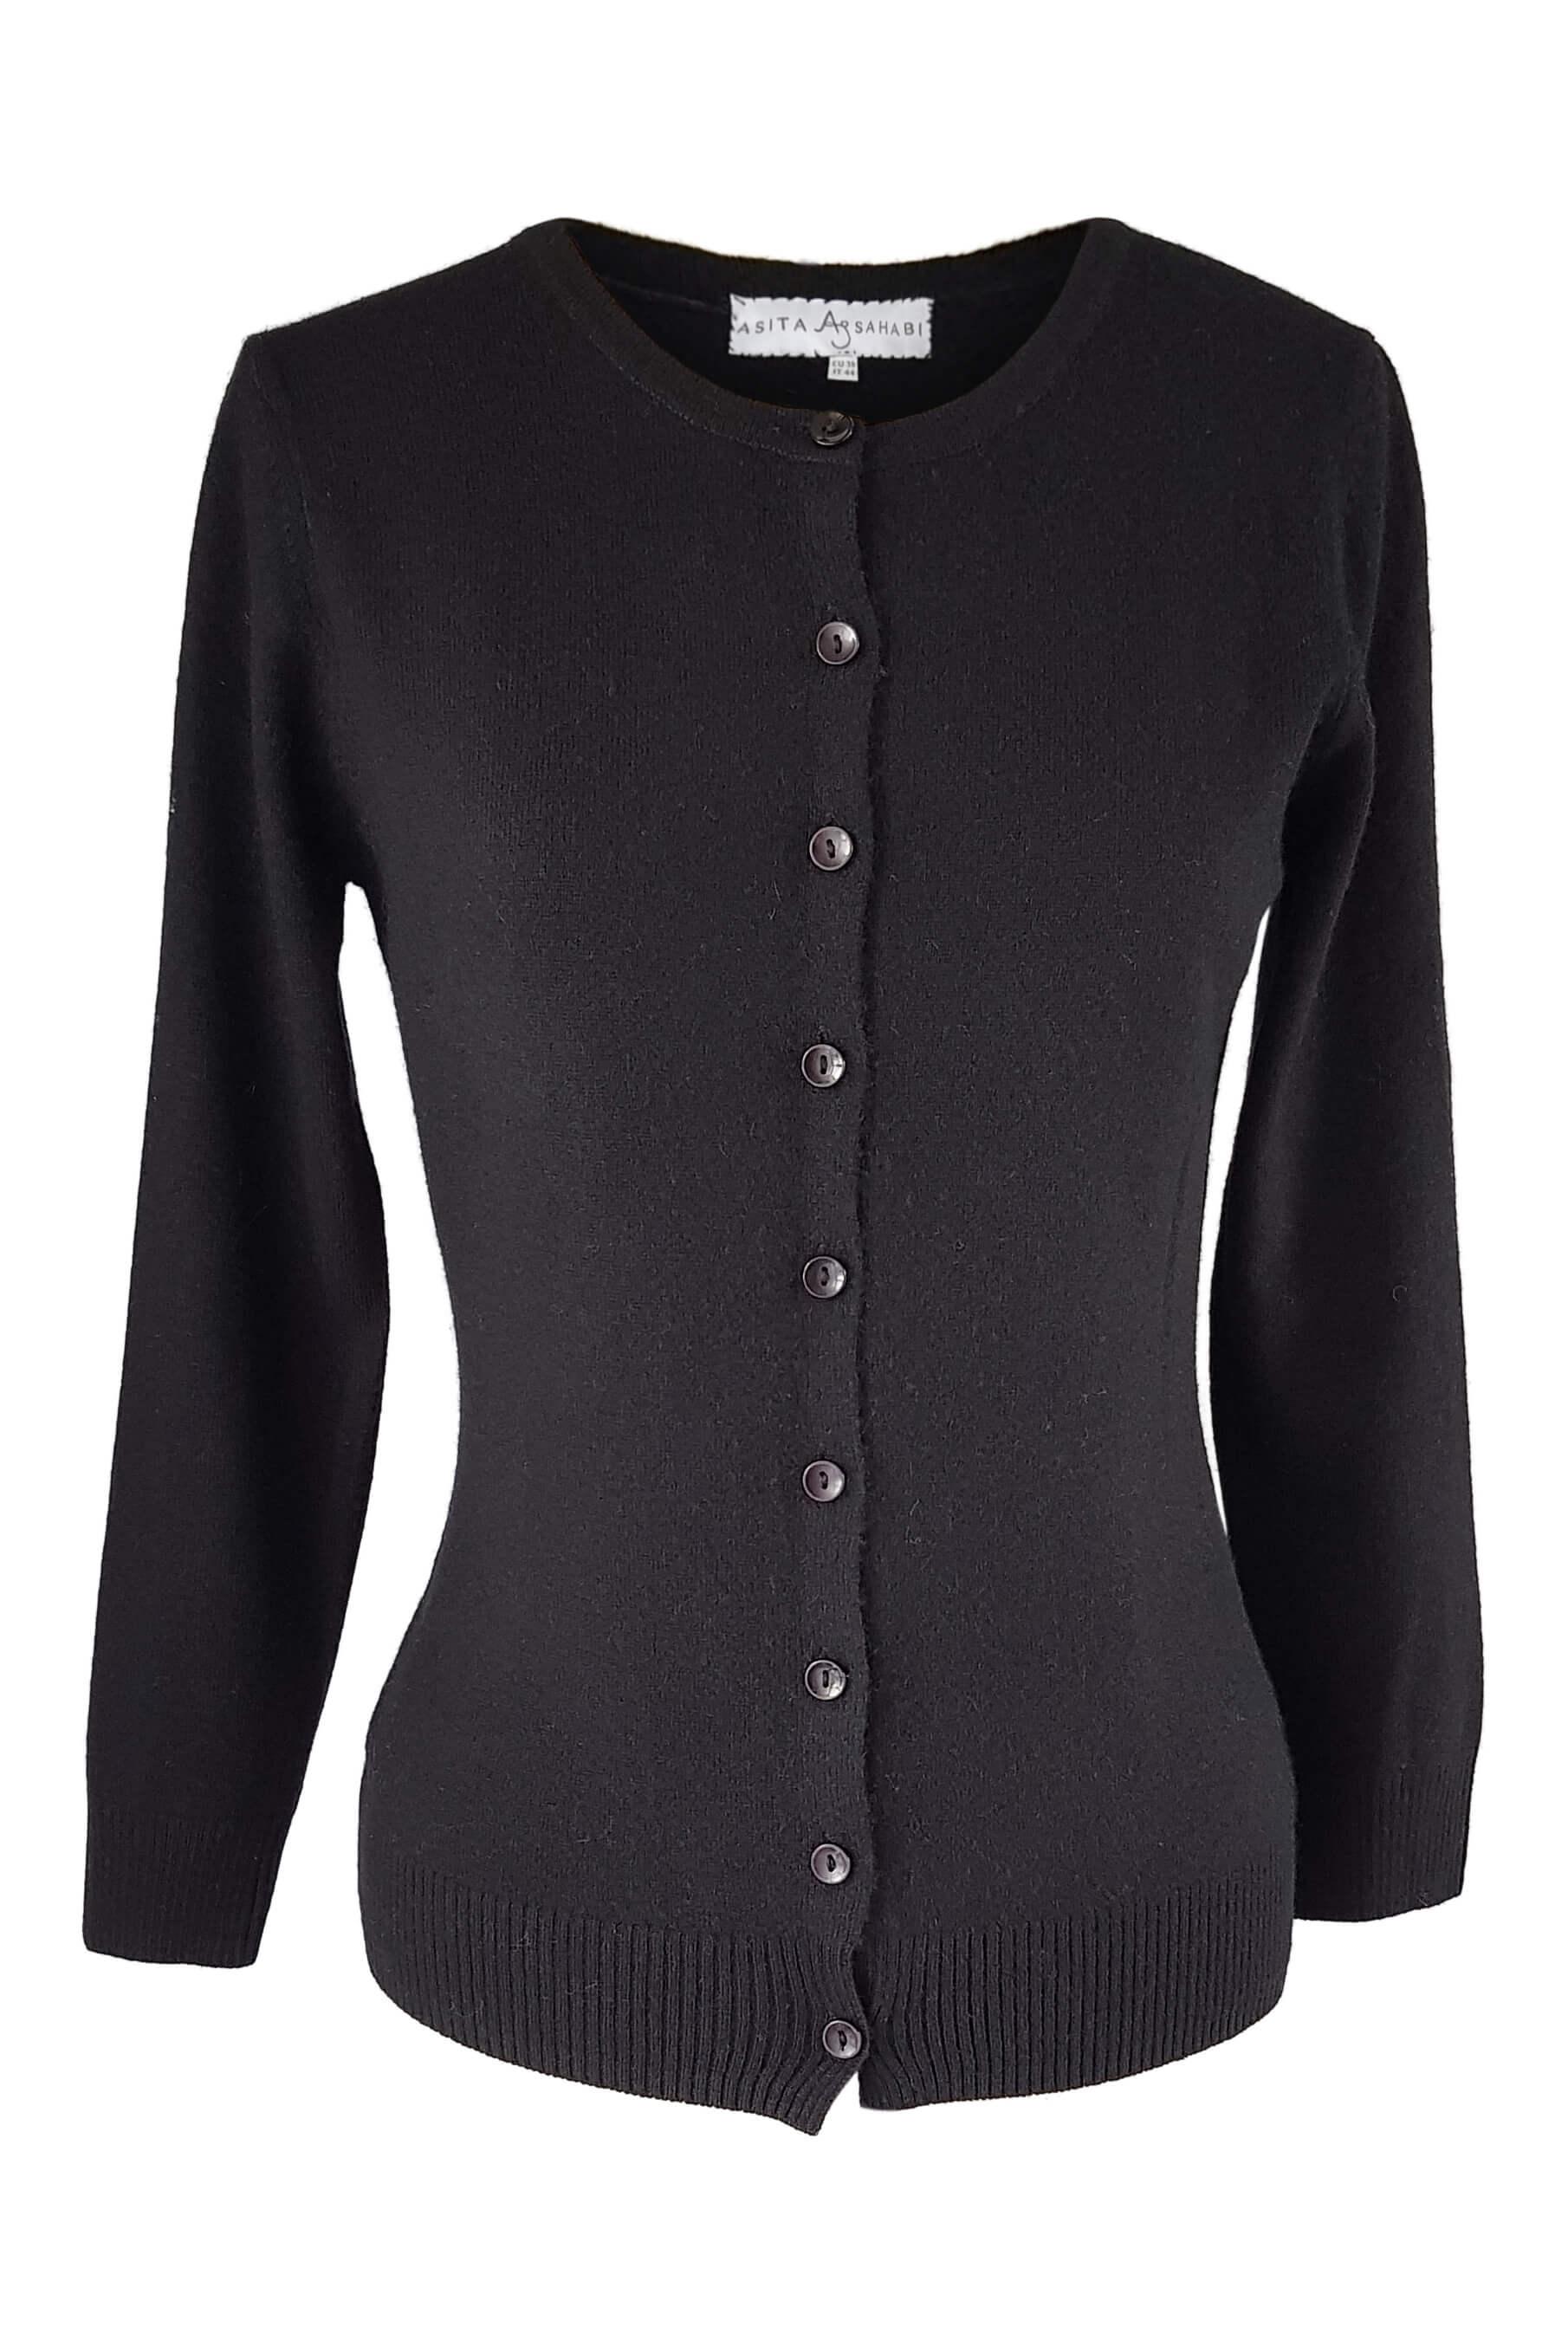 black cashmere cardigan | fine knitwear